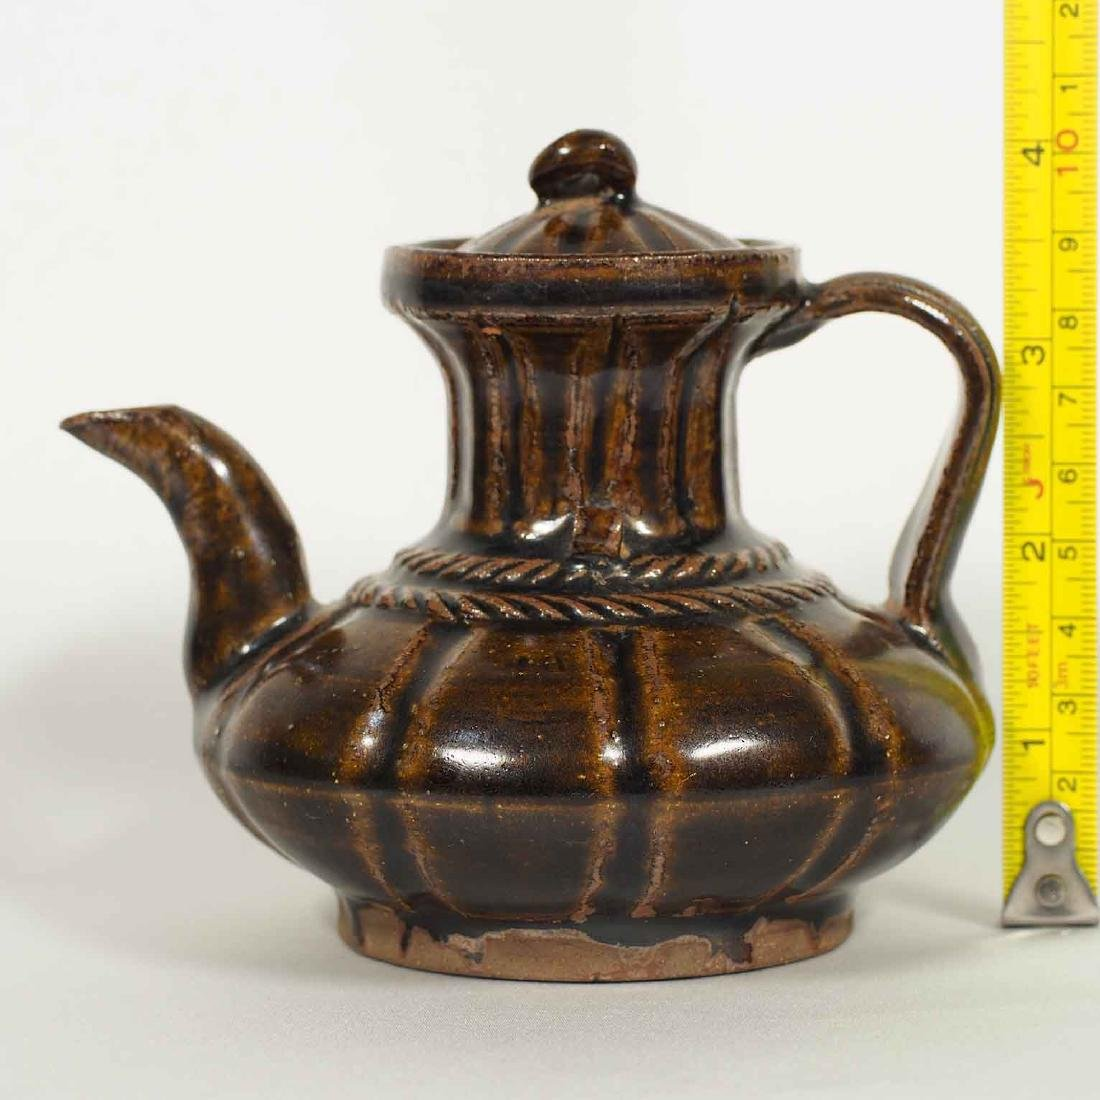 Black glazed Arabic Style Ewer with Lid, Song Dynasty - 12